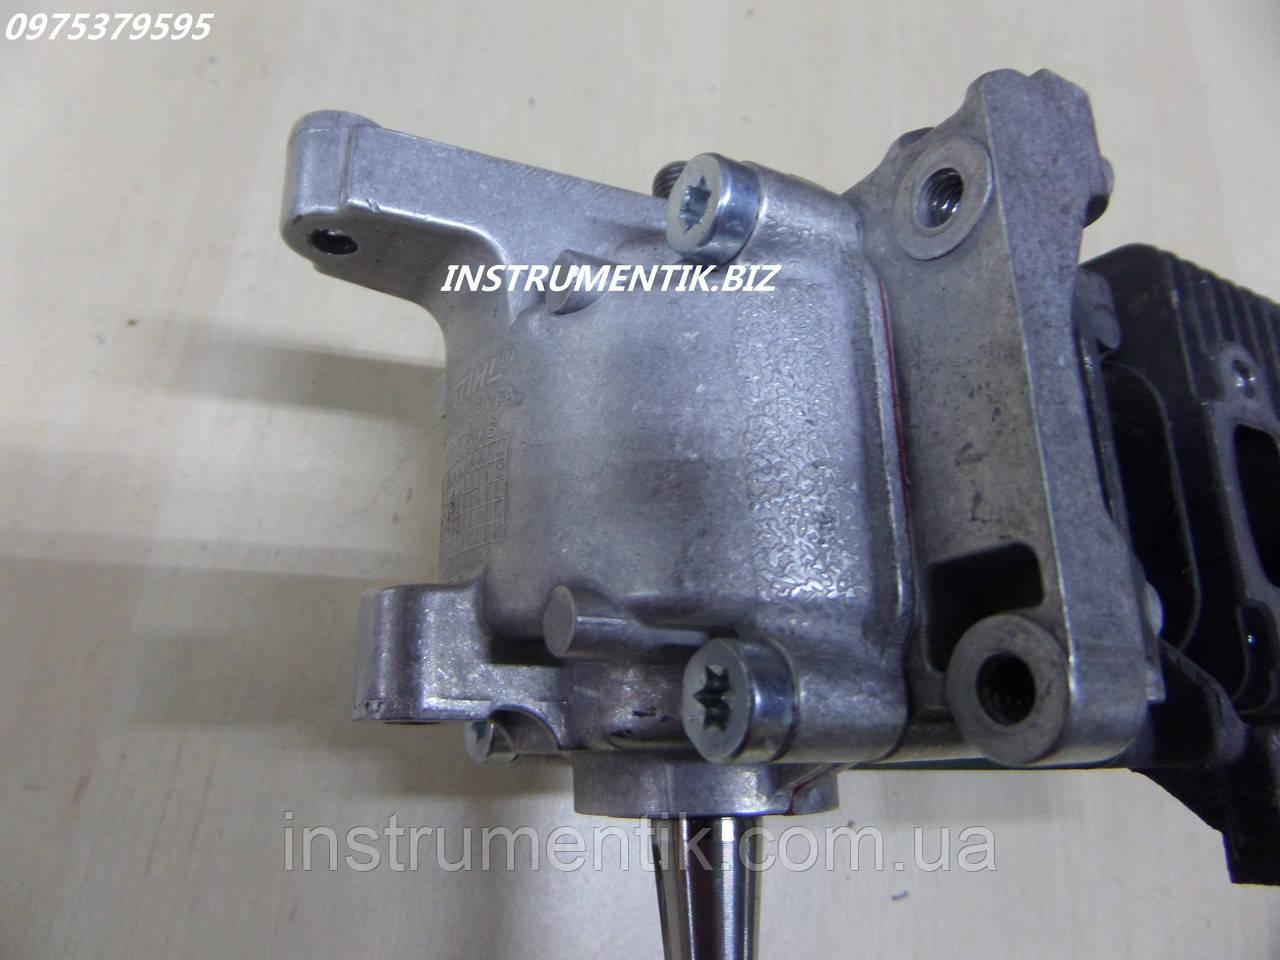 Поддон цилиндра для мотокосы Stihl FS 55